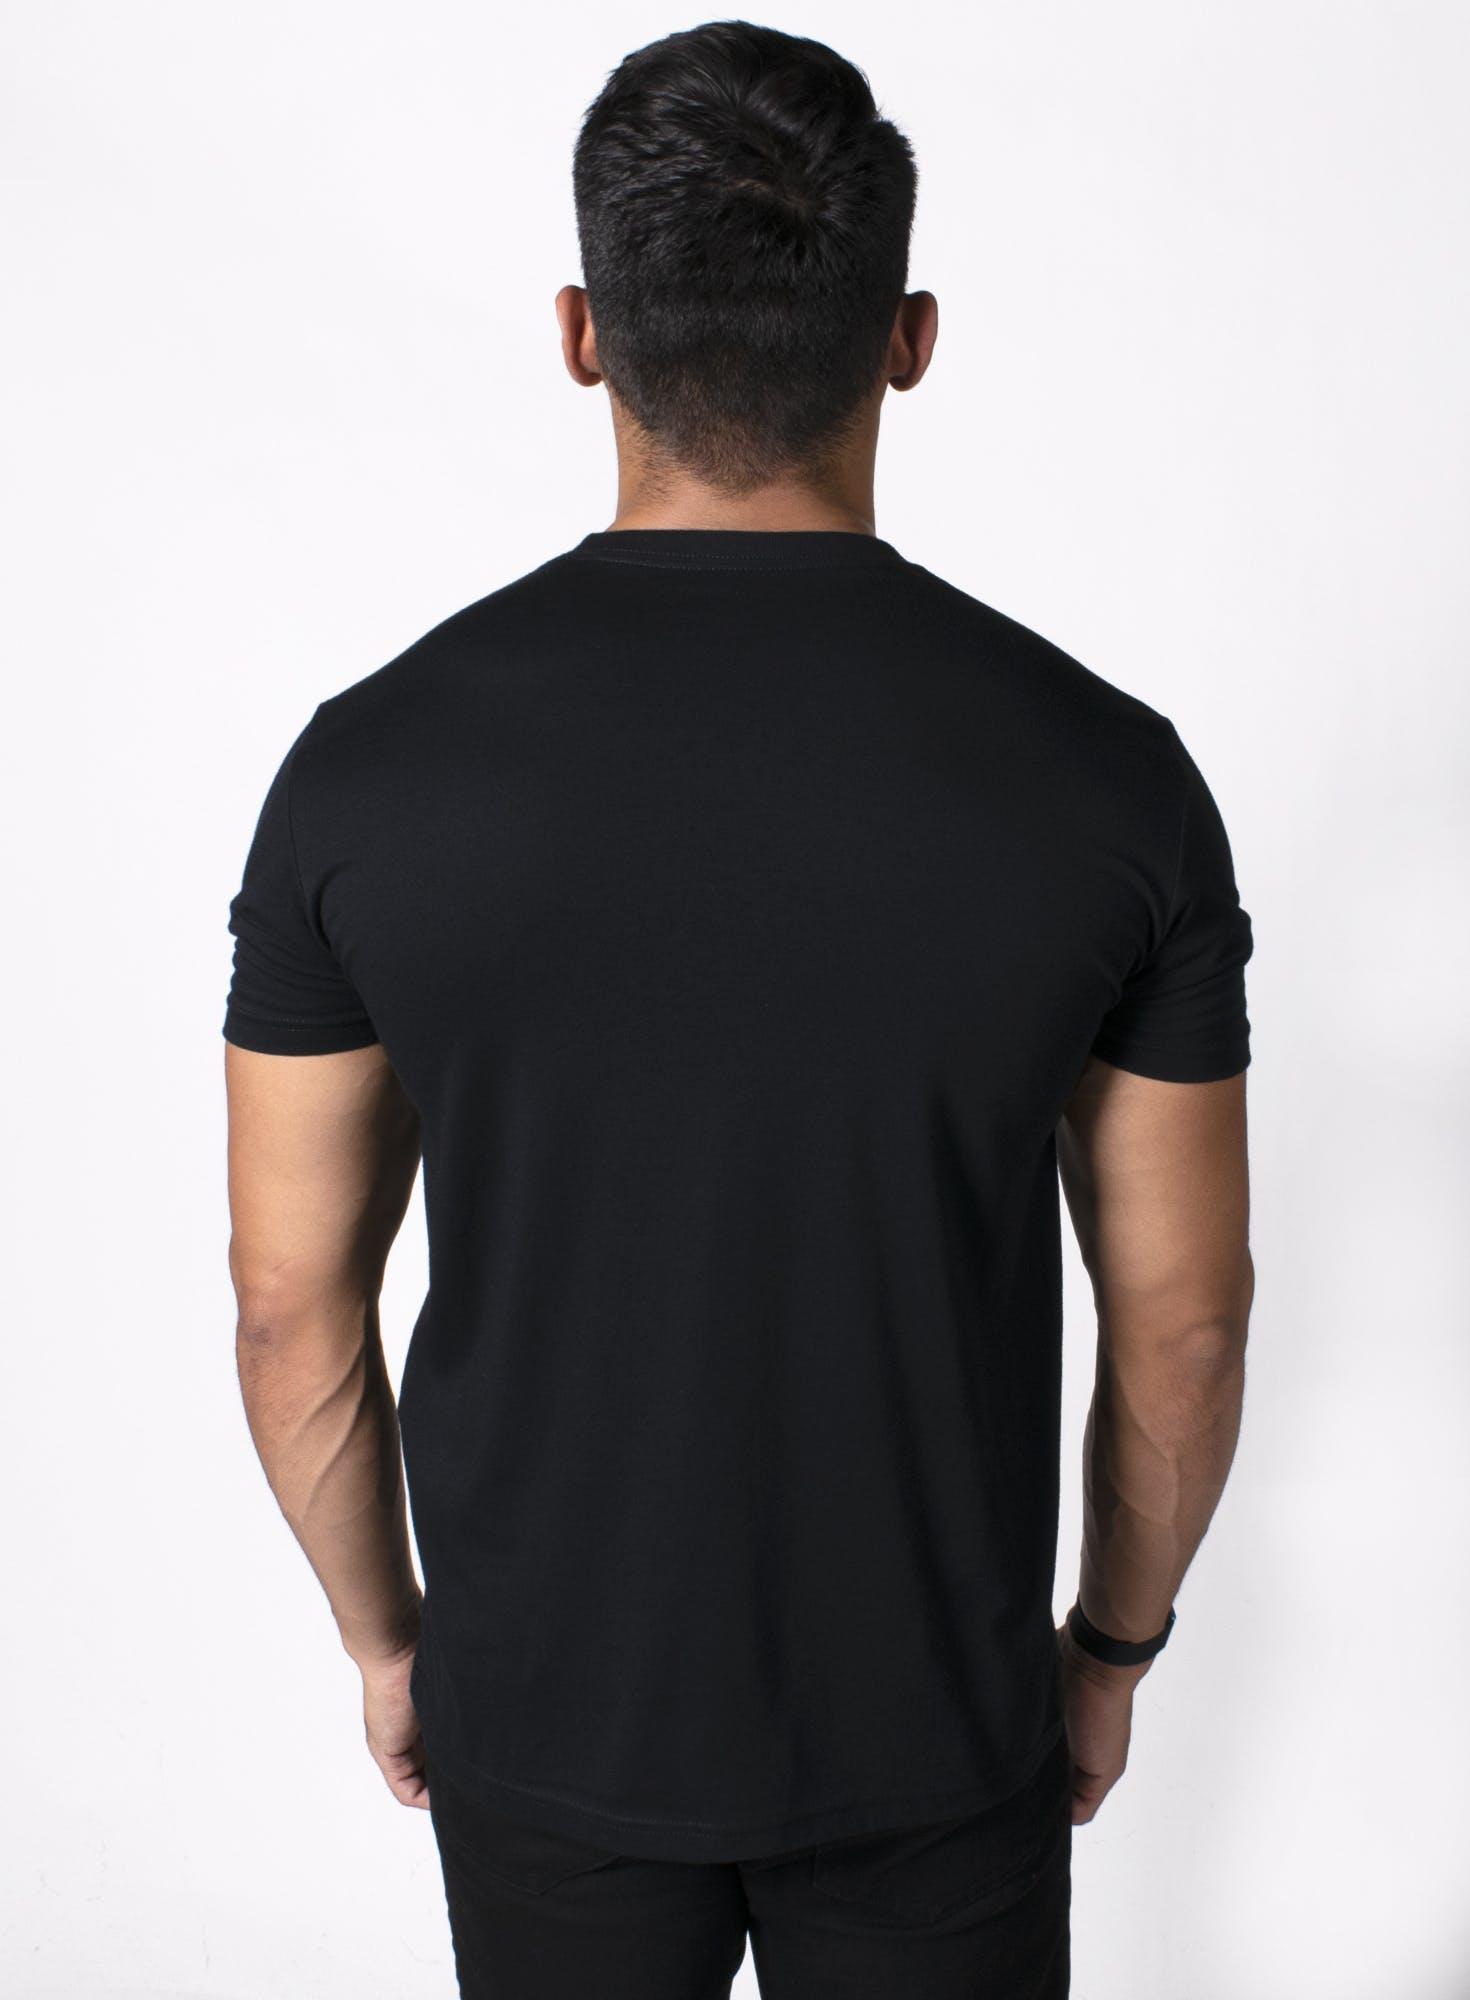 Ape Lotus T-shirt Bonus Image